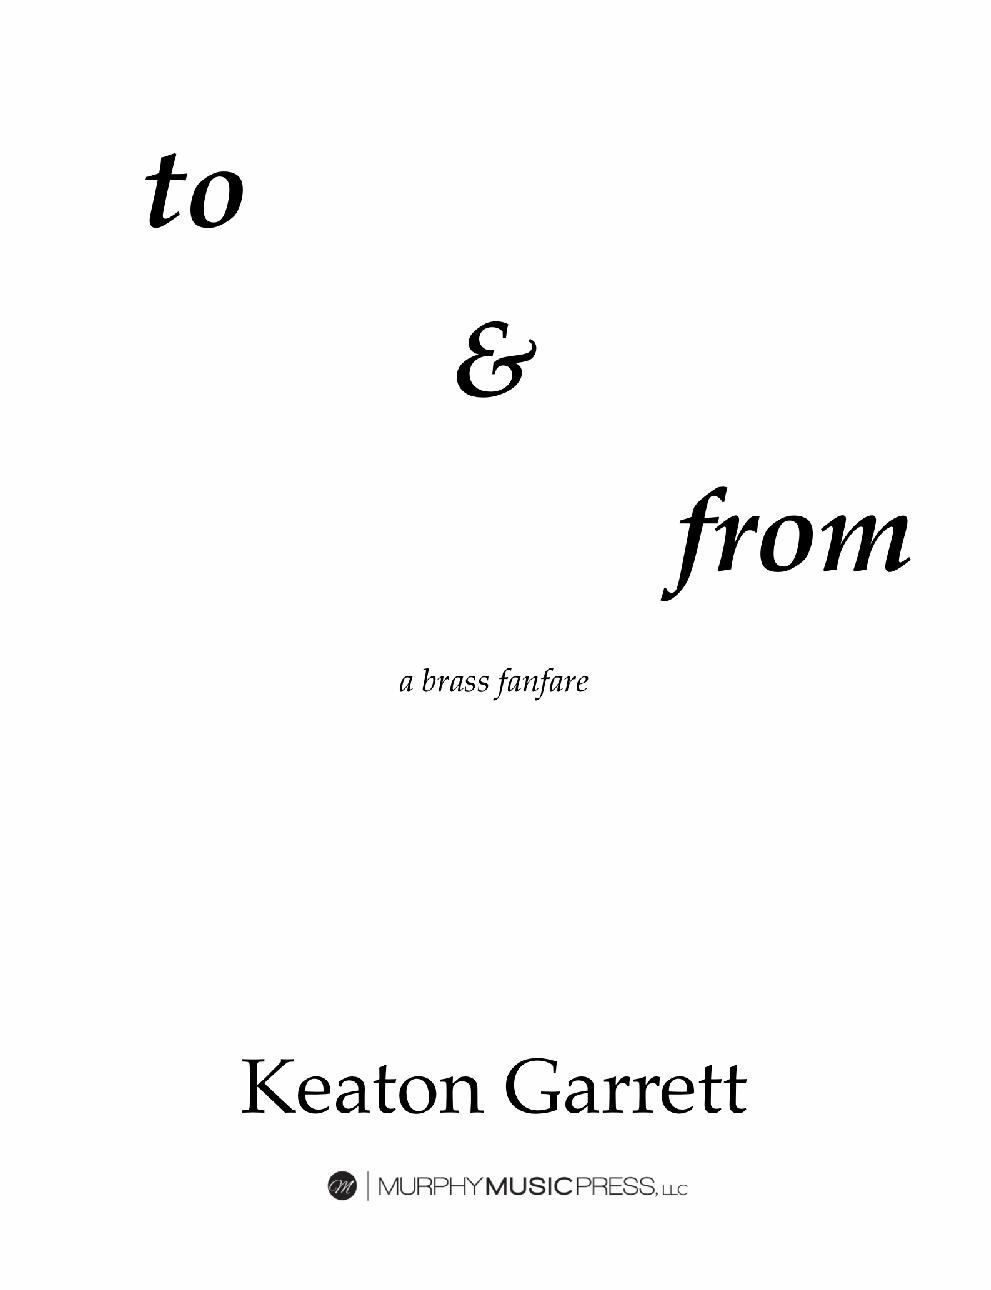 To & From by Keaton Garrett